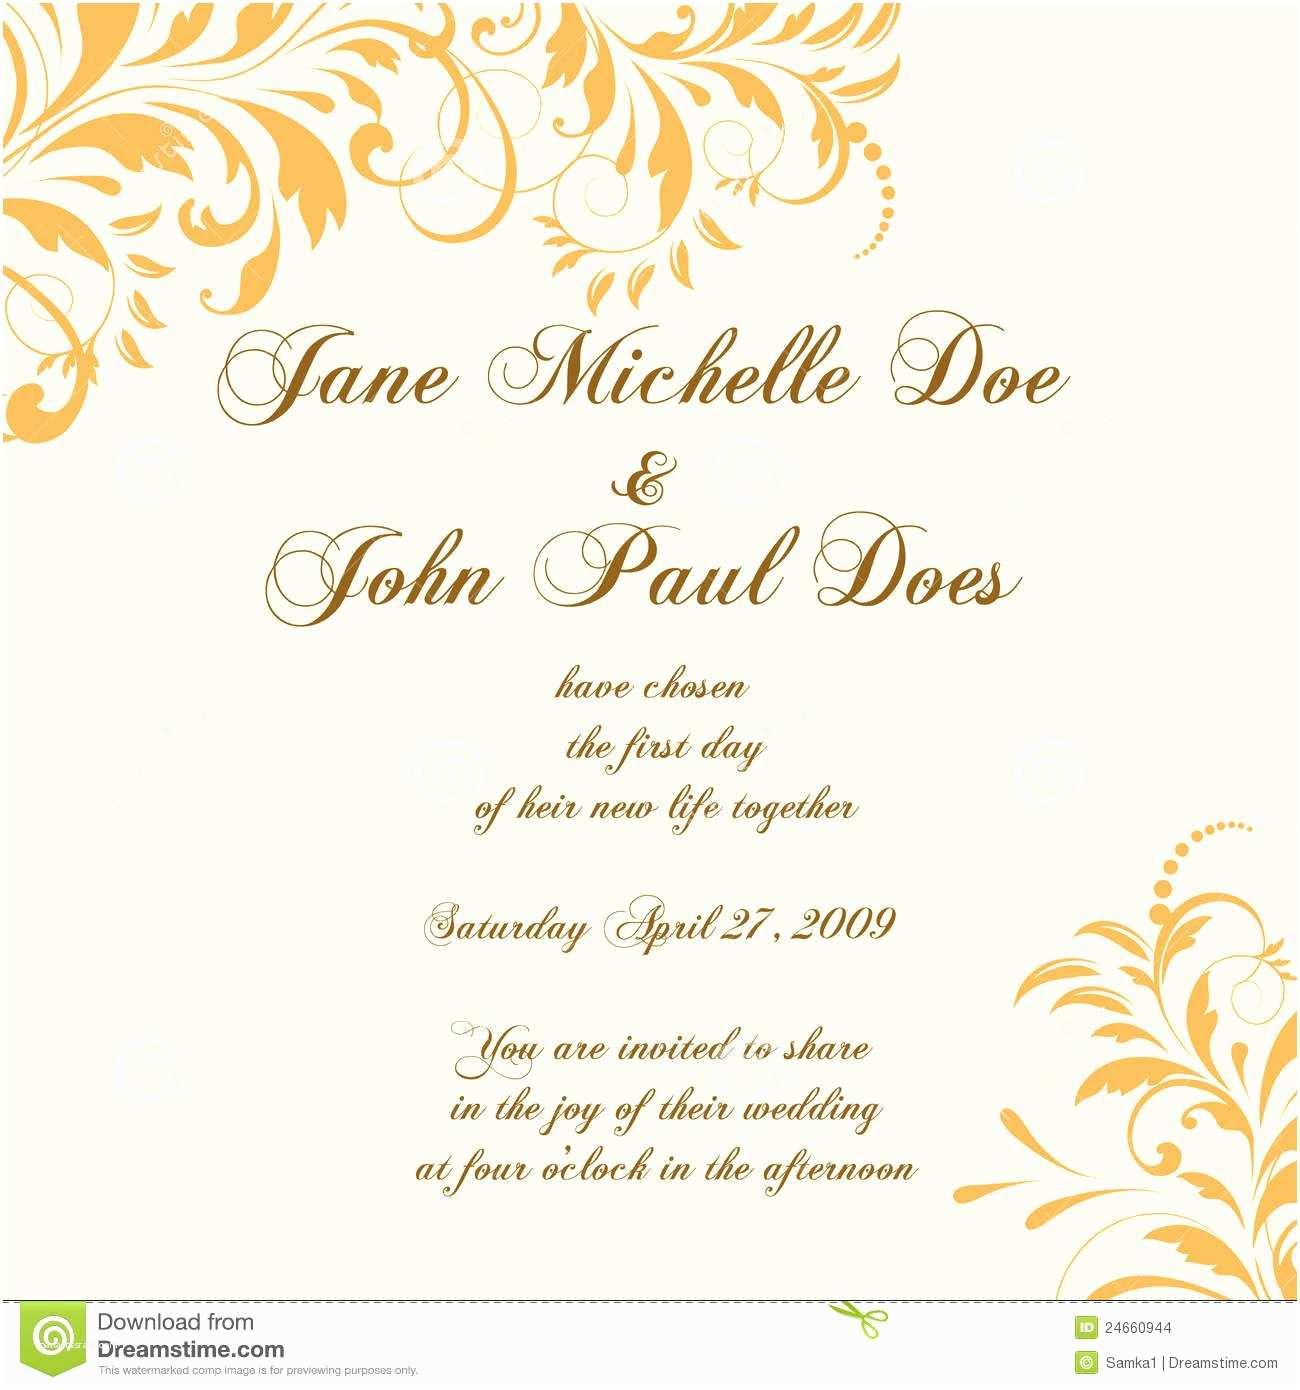 Wedding Invitation Card Maker Wedding Card Invitation